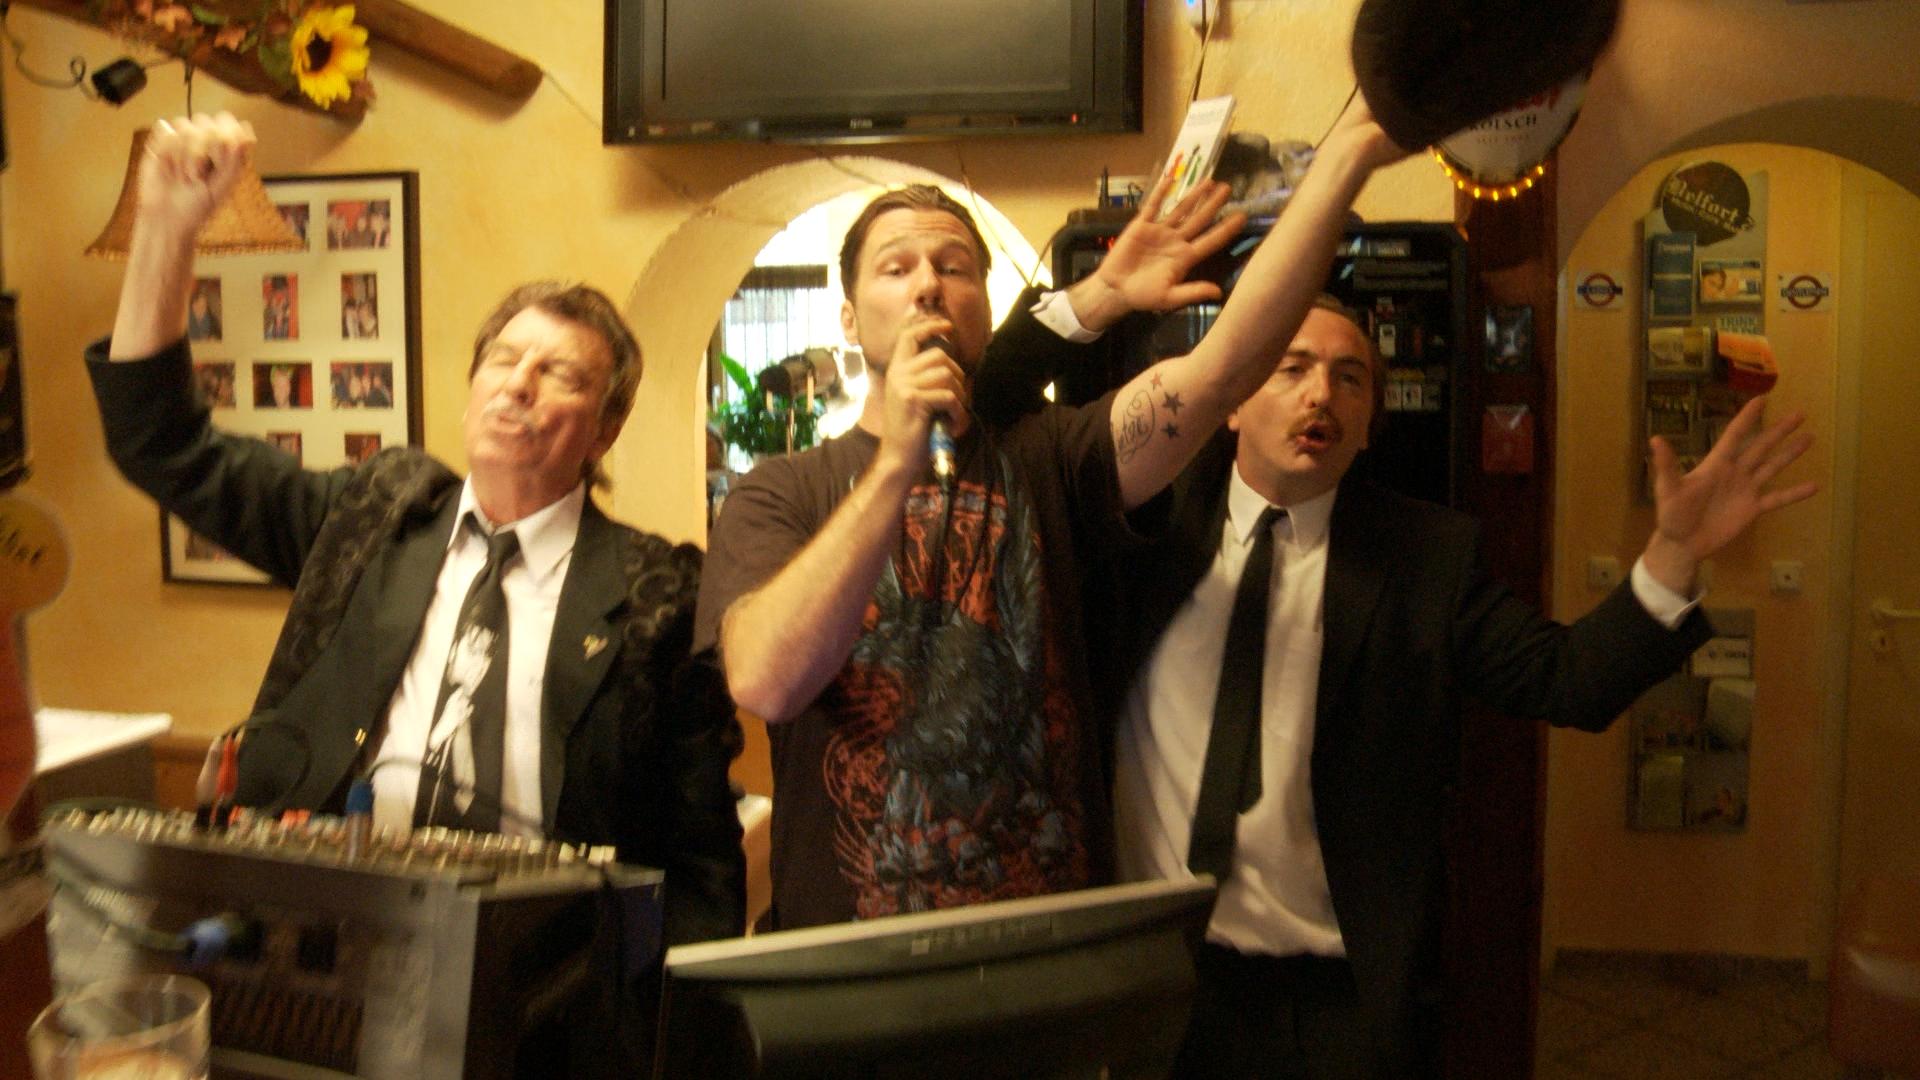 Karaoke King, Markus Hammer, M.M. Eschenbach - Folge 5